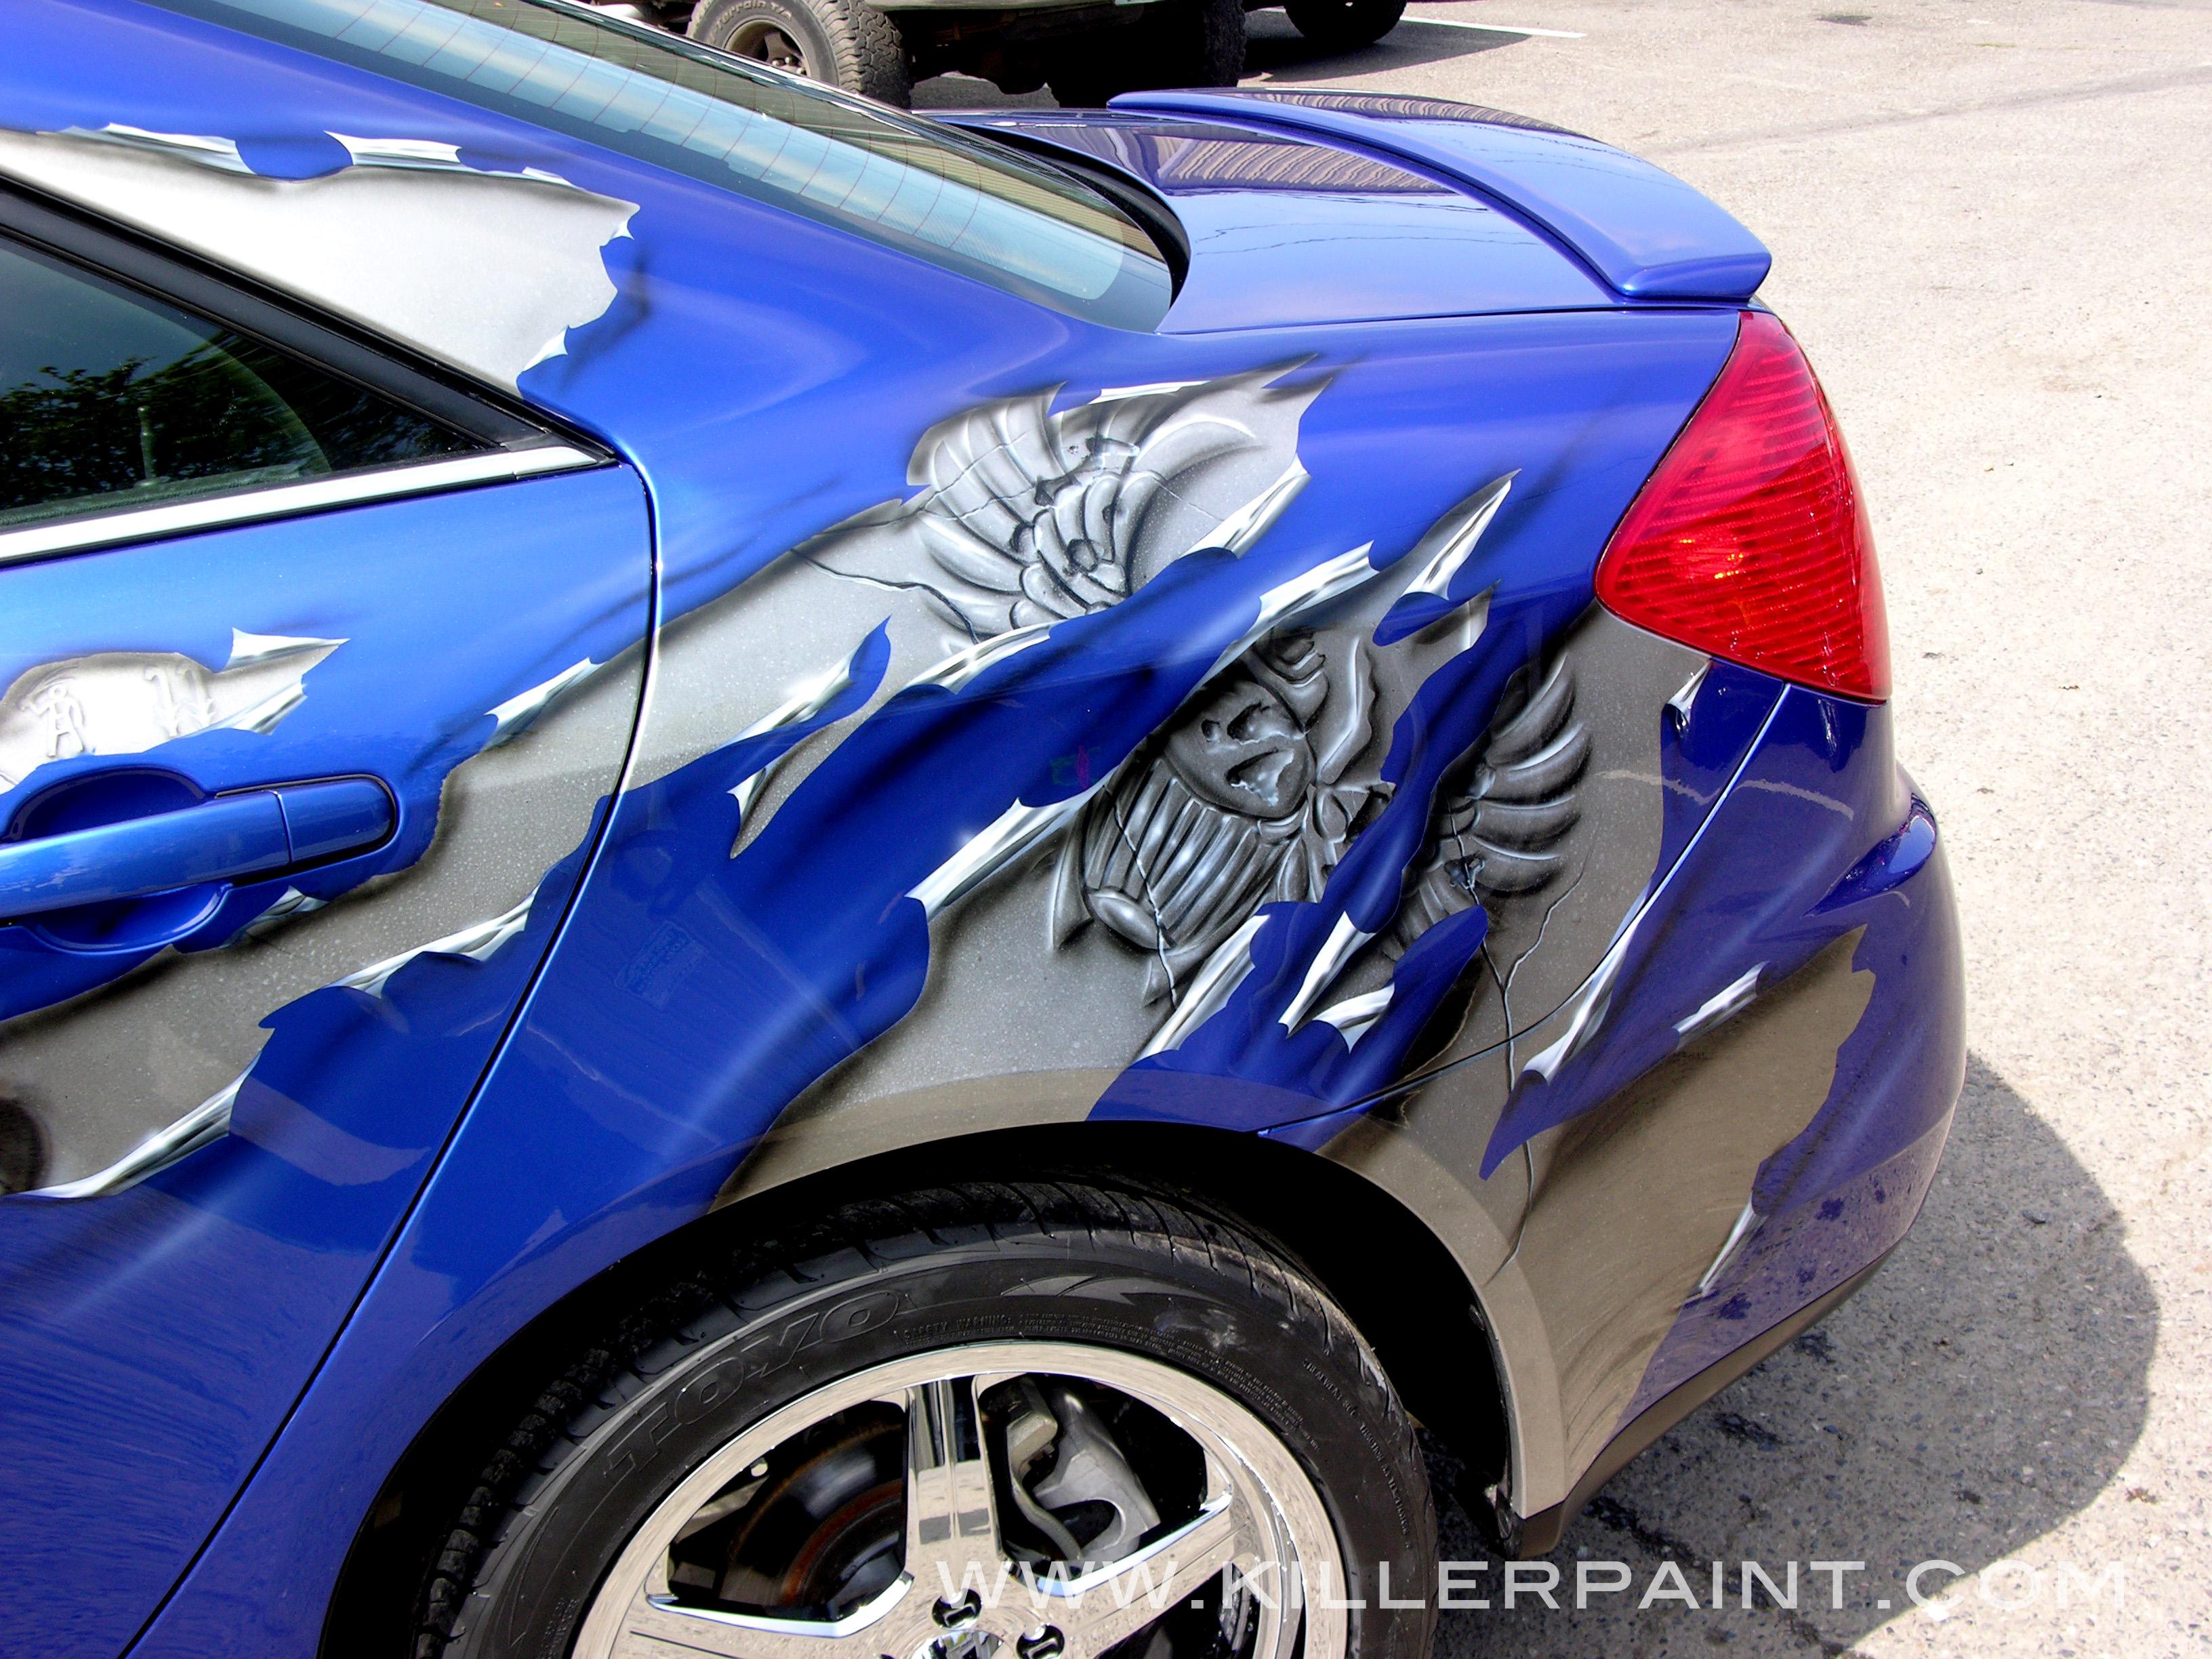 shreds  Killer Paint Airbrush Studio